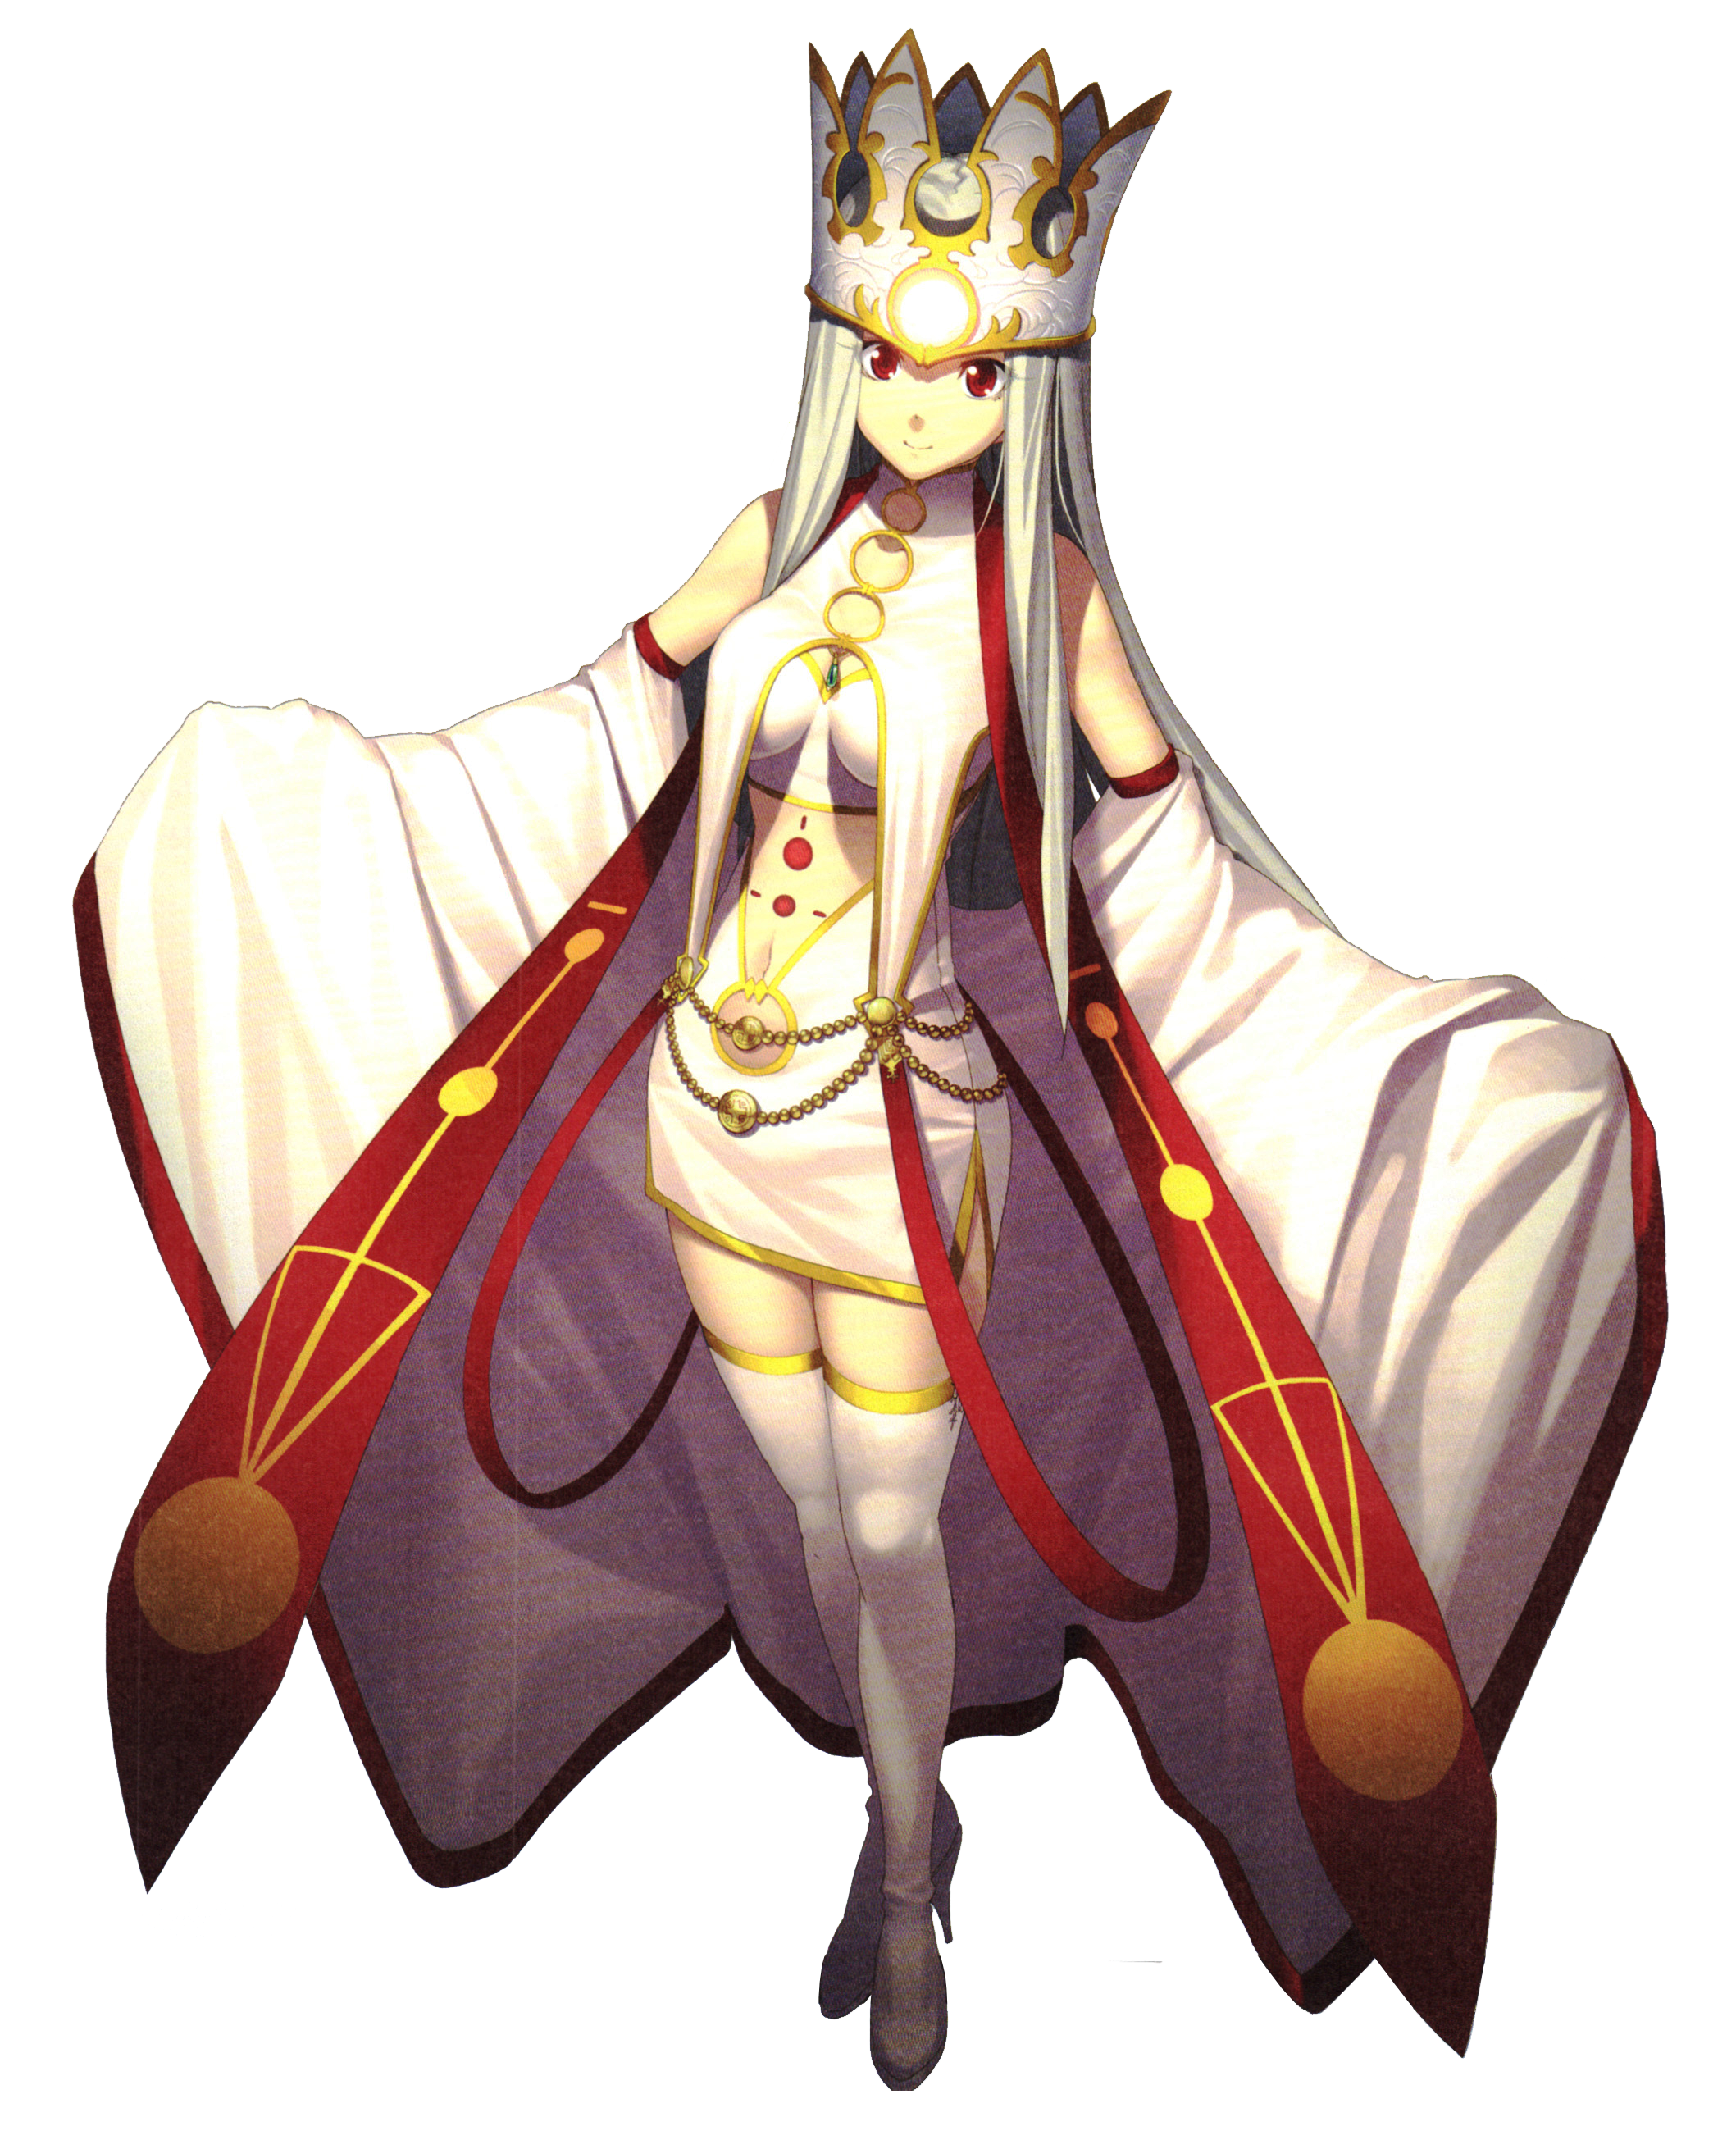 Pumpkin gordes hd clipart jpg royalty free stock Caster (Fate/Grand Order - Iri)   TYPE-MOON Wiki   FANDOM powered by ... jpg royalty free stock